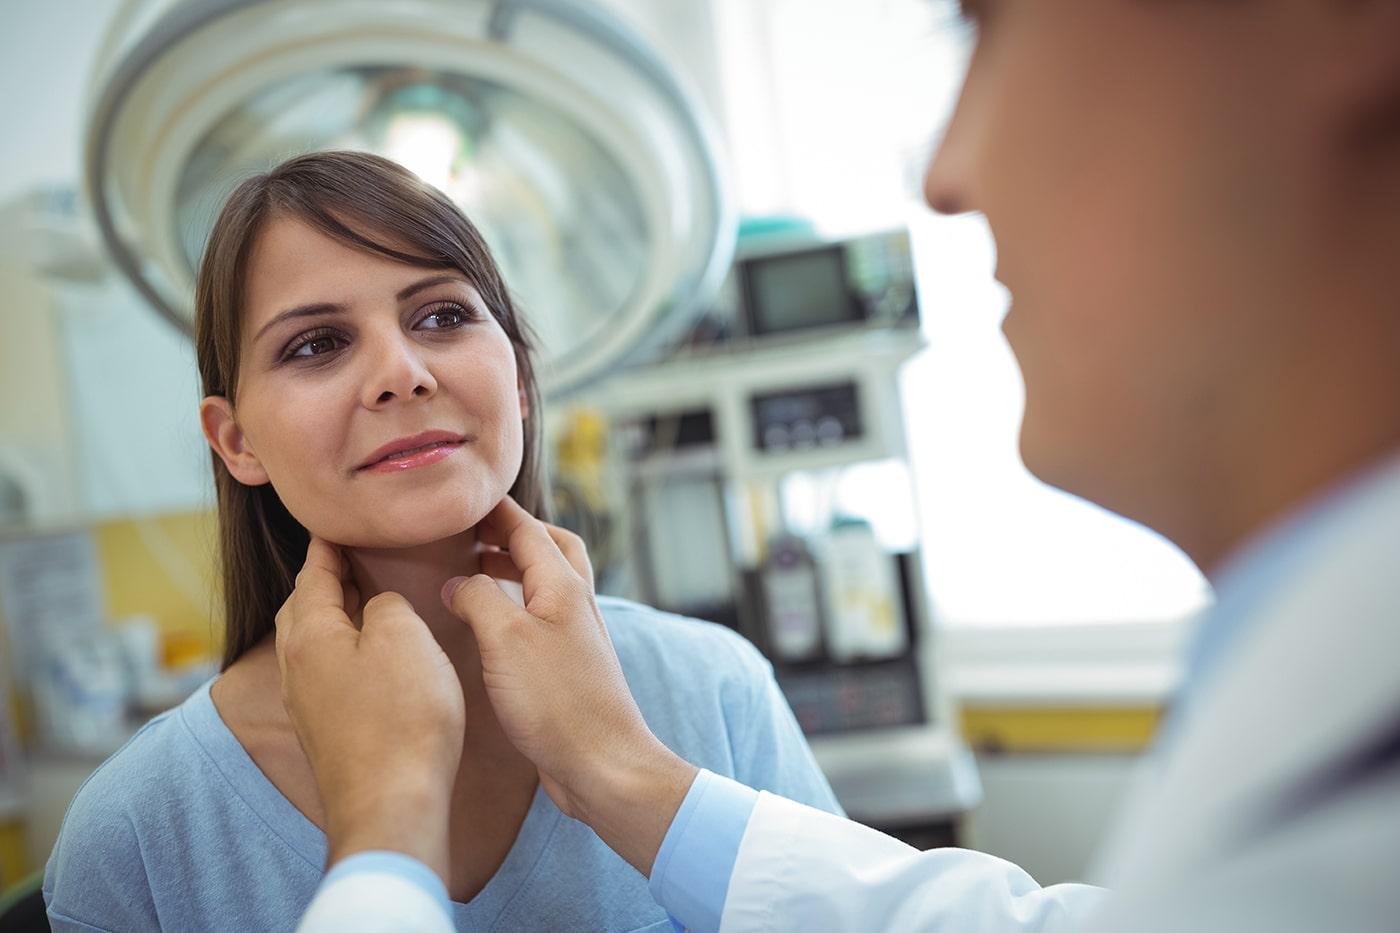 Doctor examining woman's thyroid